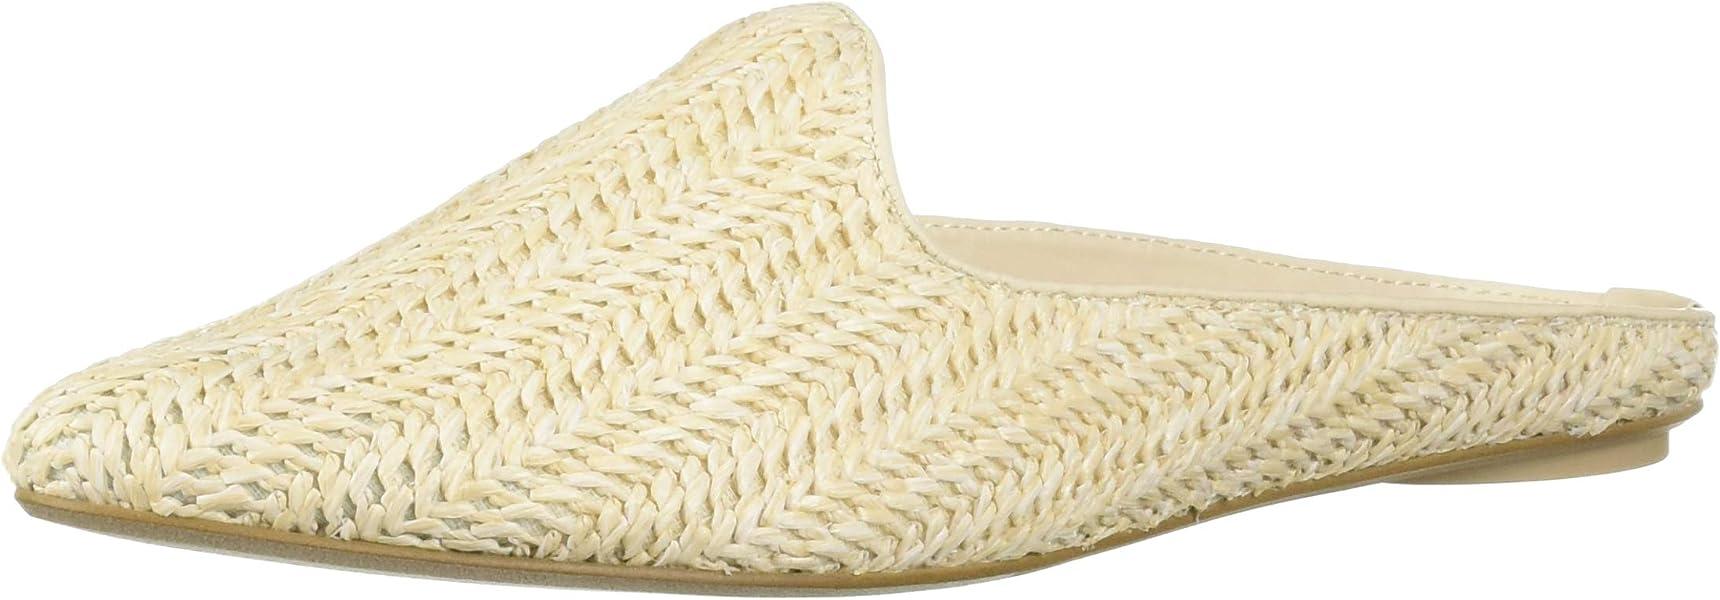 8e7a0e1b348b Amazon.com  Dolce Vita Women s Grant Mule Ivory Raffia 6 M US  Shoes